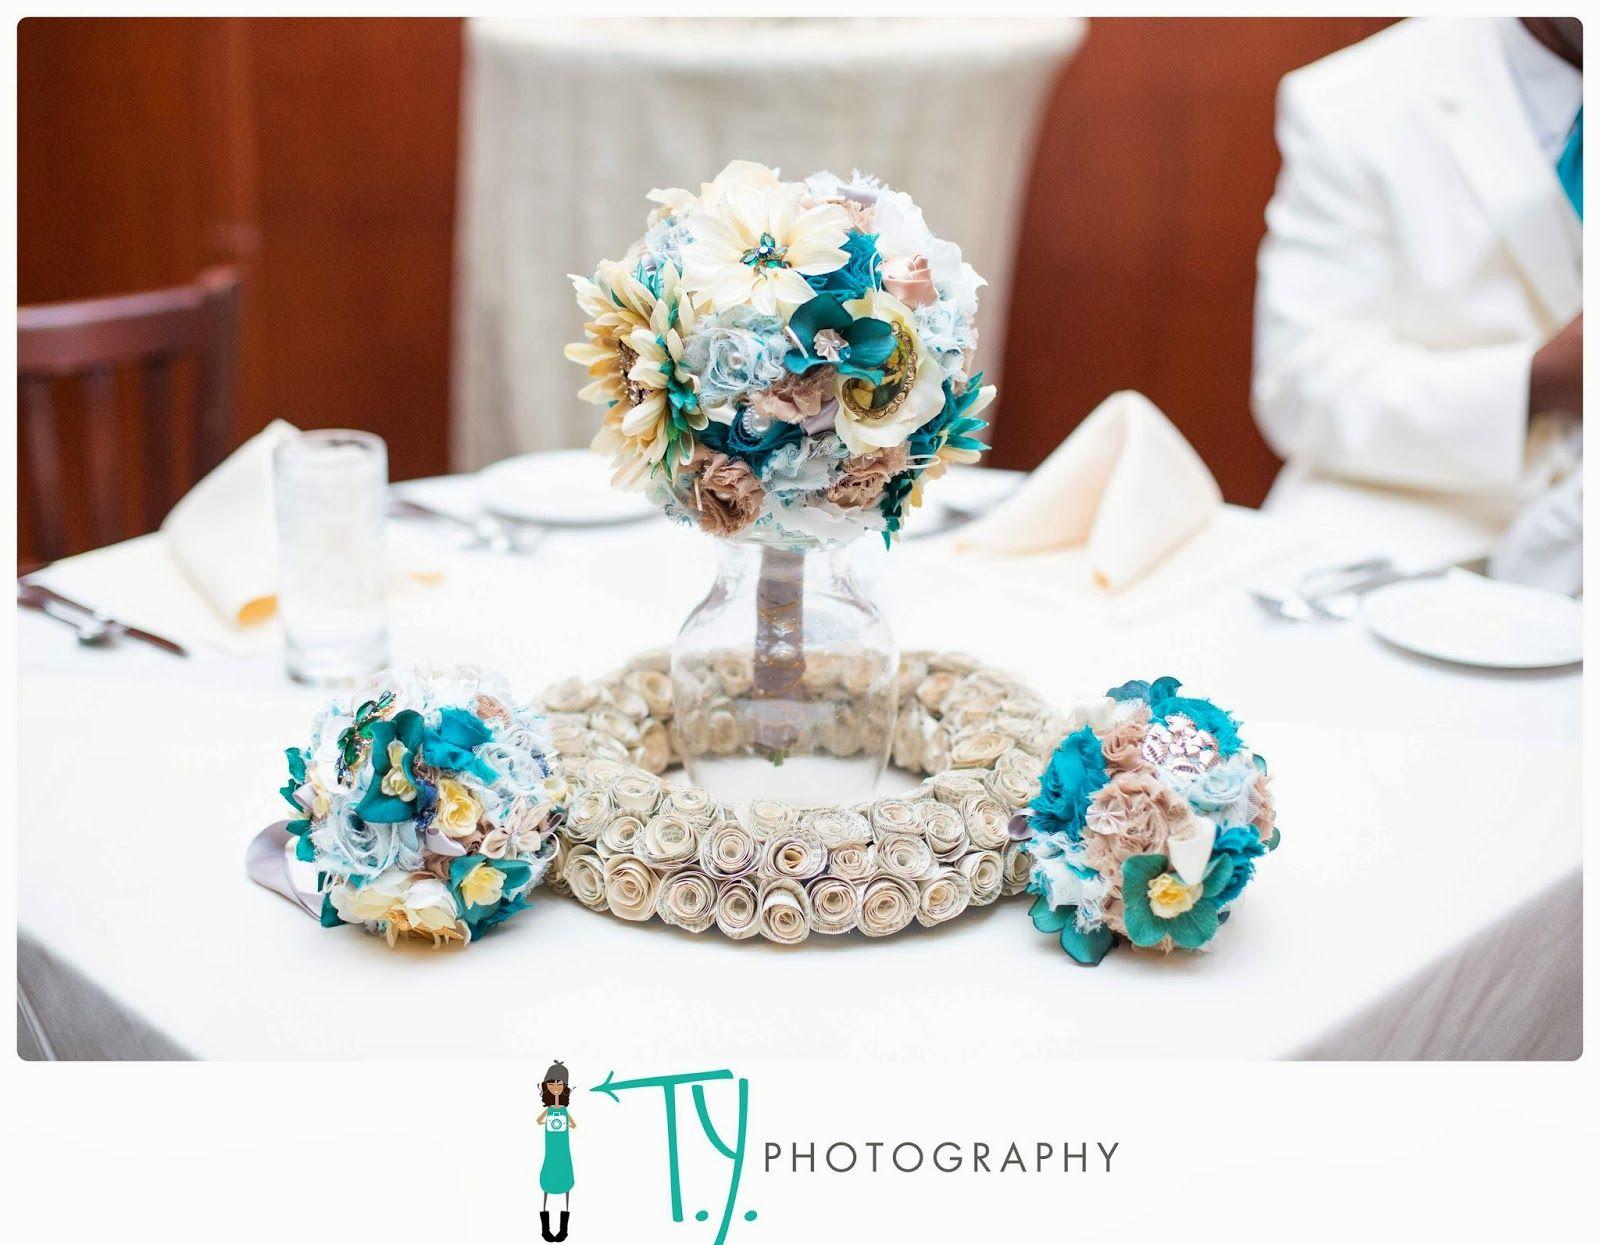 Do It Yourself Centerpieces, Diy Wedding Decorations, Handmade Wedding Decorations,